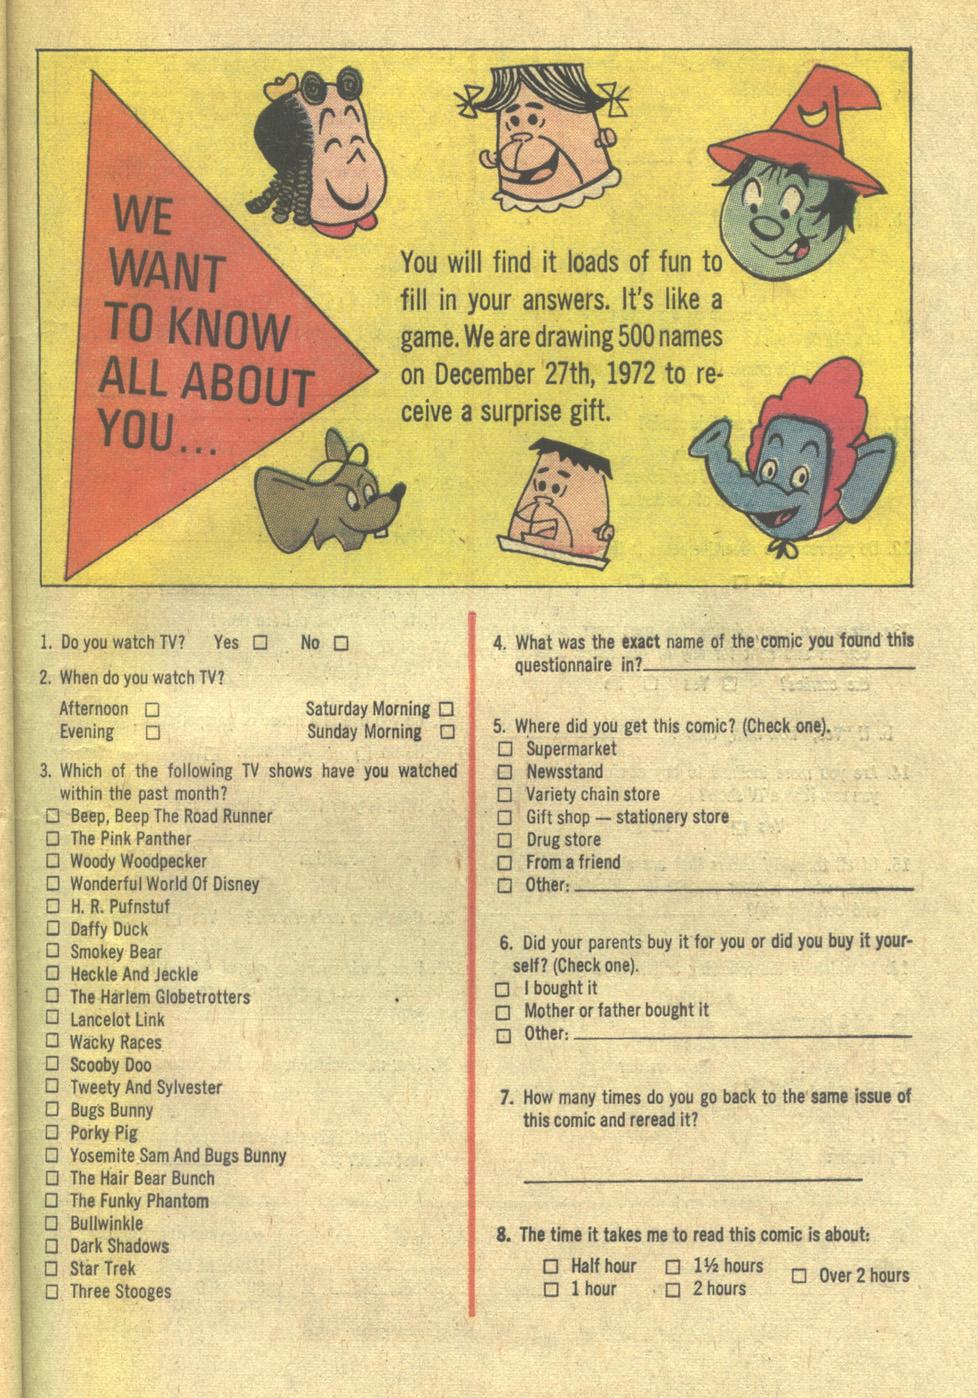 Comic Huey, Dewey, and Louie Junior Woodchucks issue 17